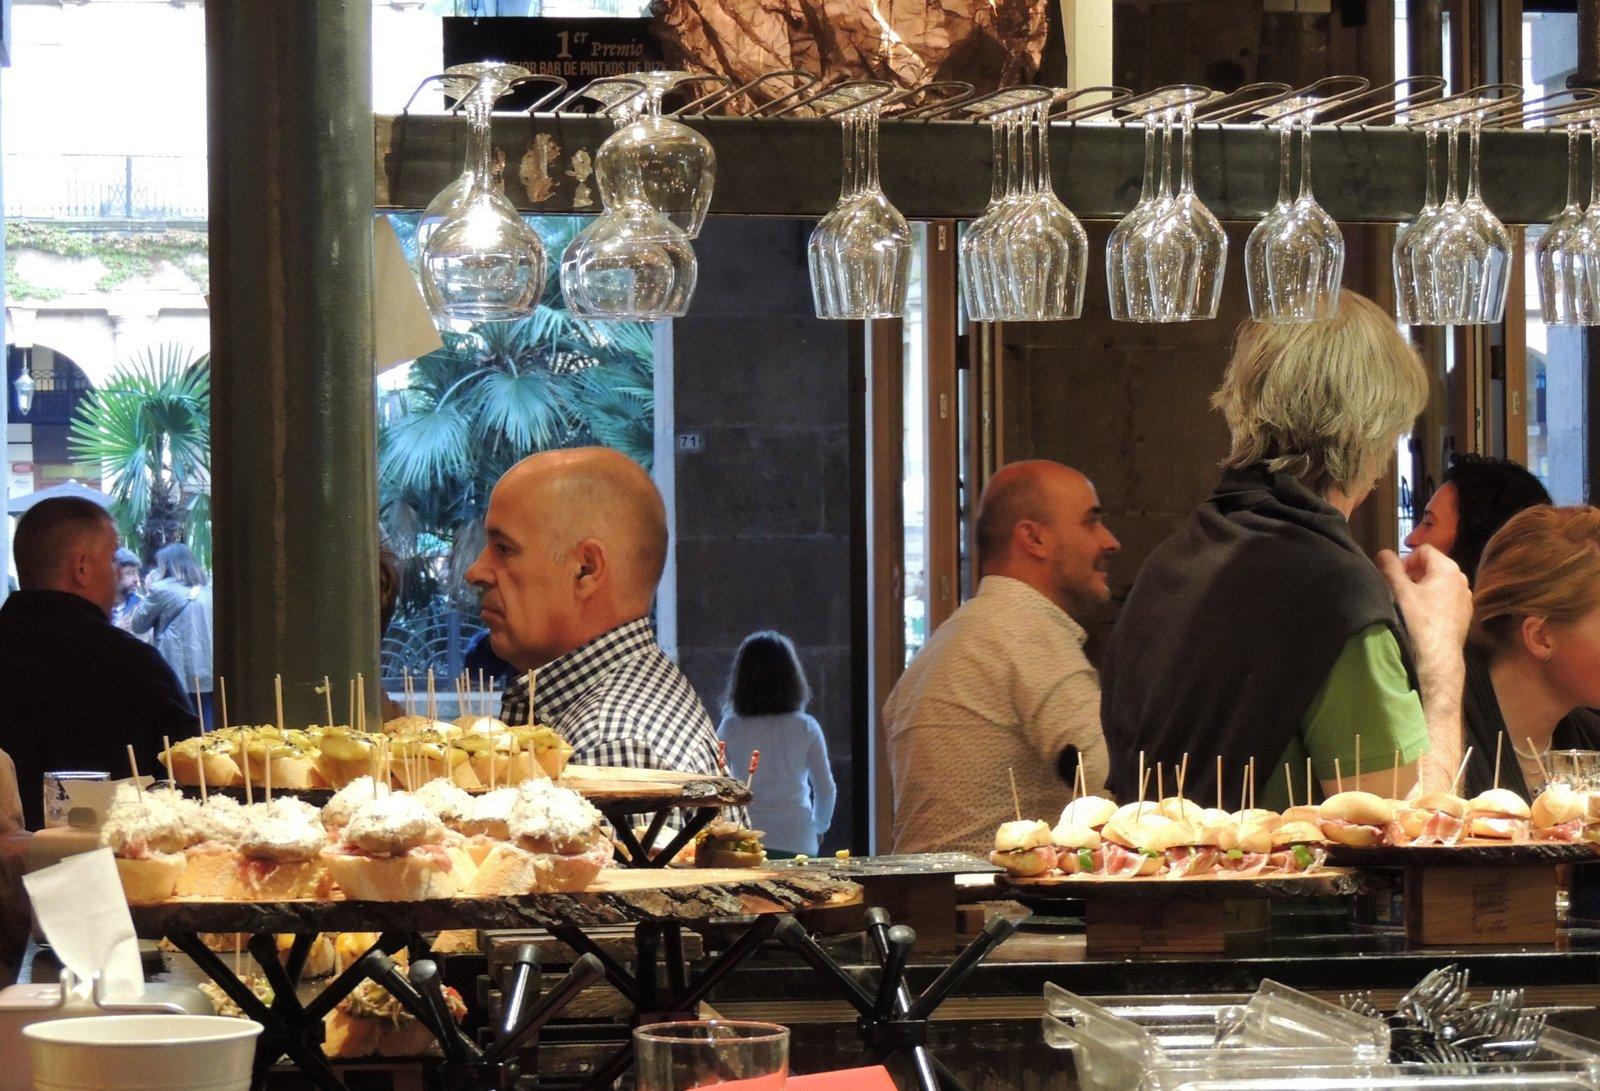 Restaurant La Olla in Bilbao